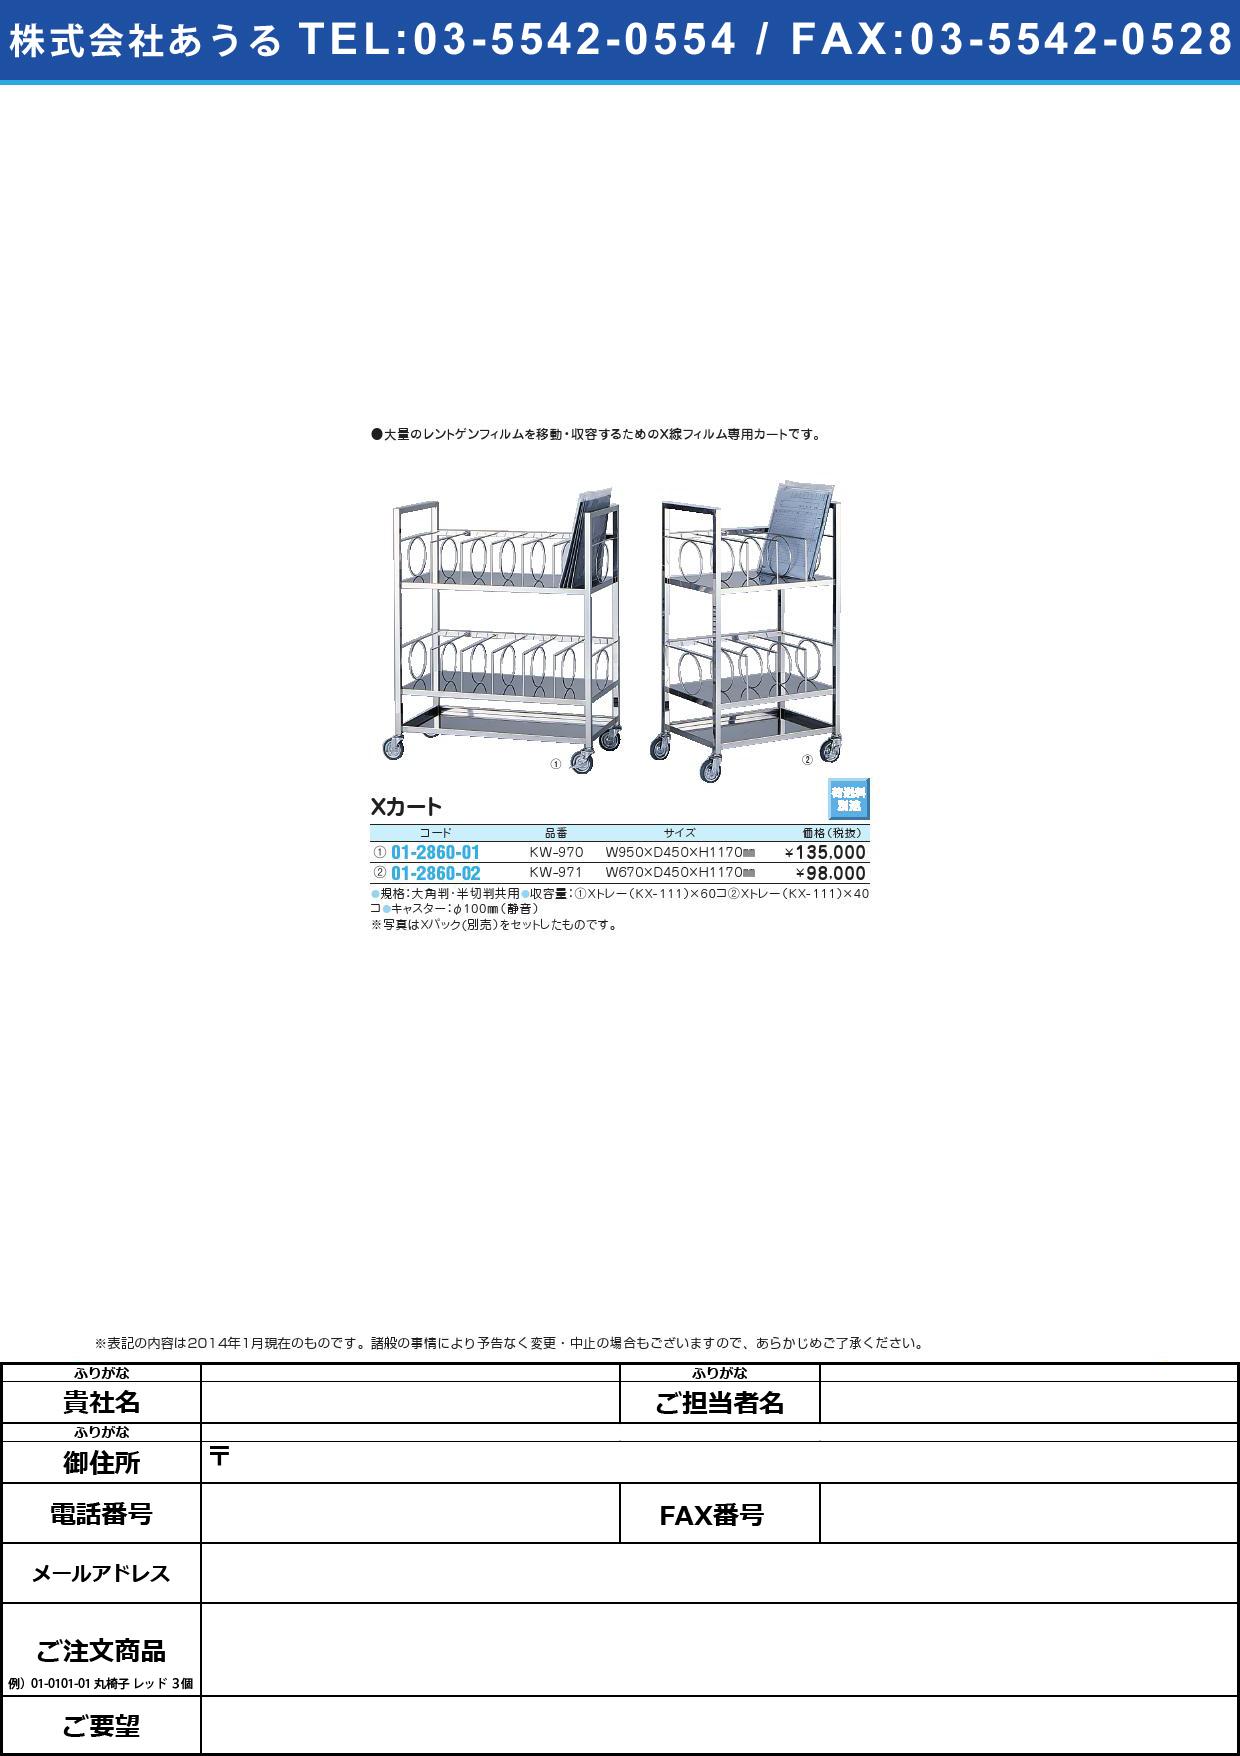 Xカート KW971(01-2860-02)KW-971【1台単位】